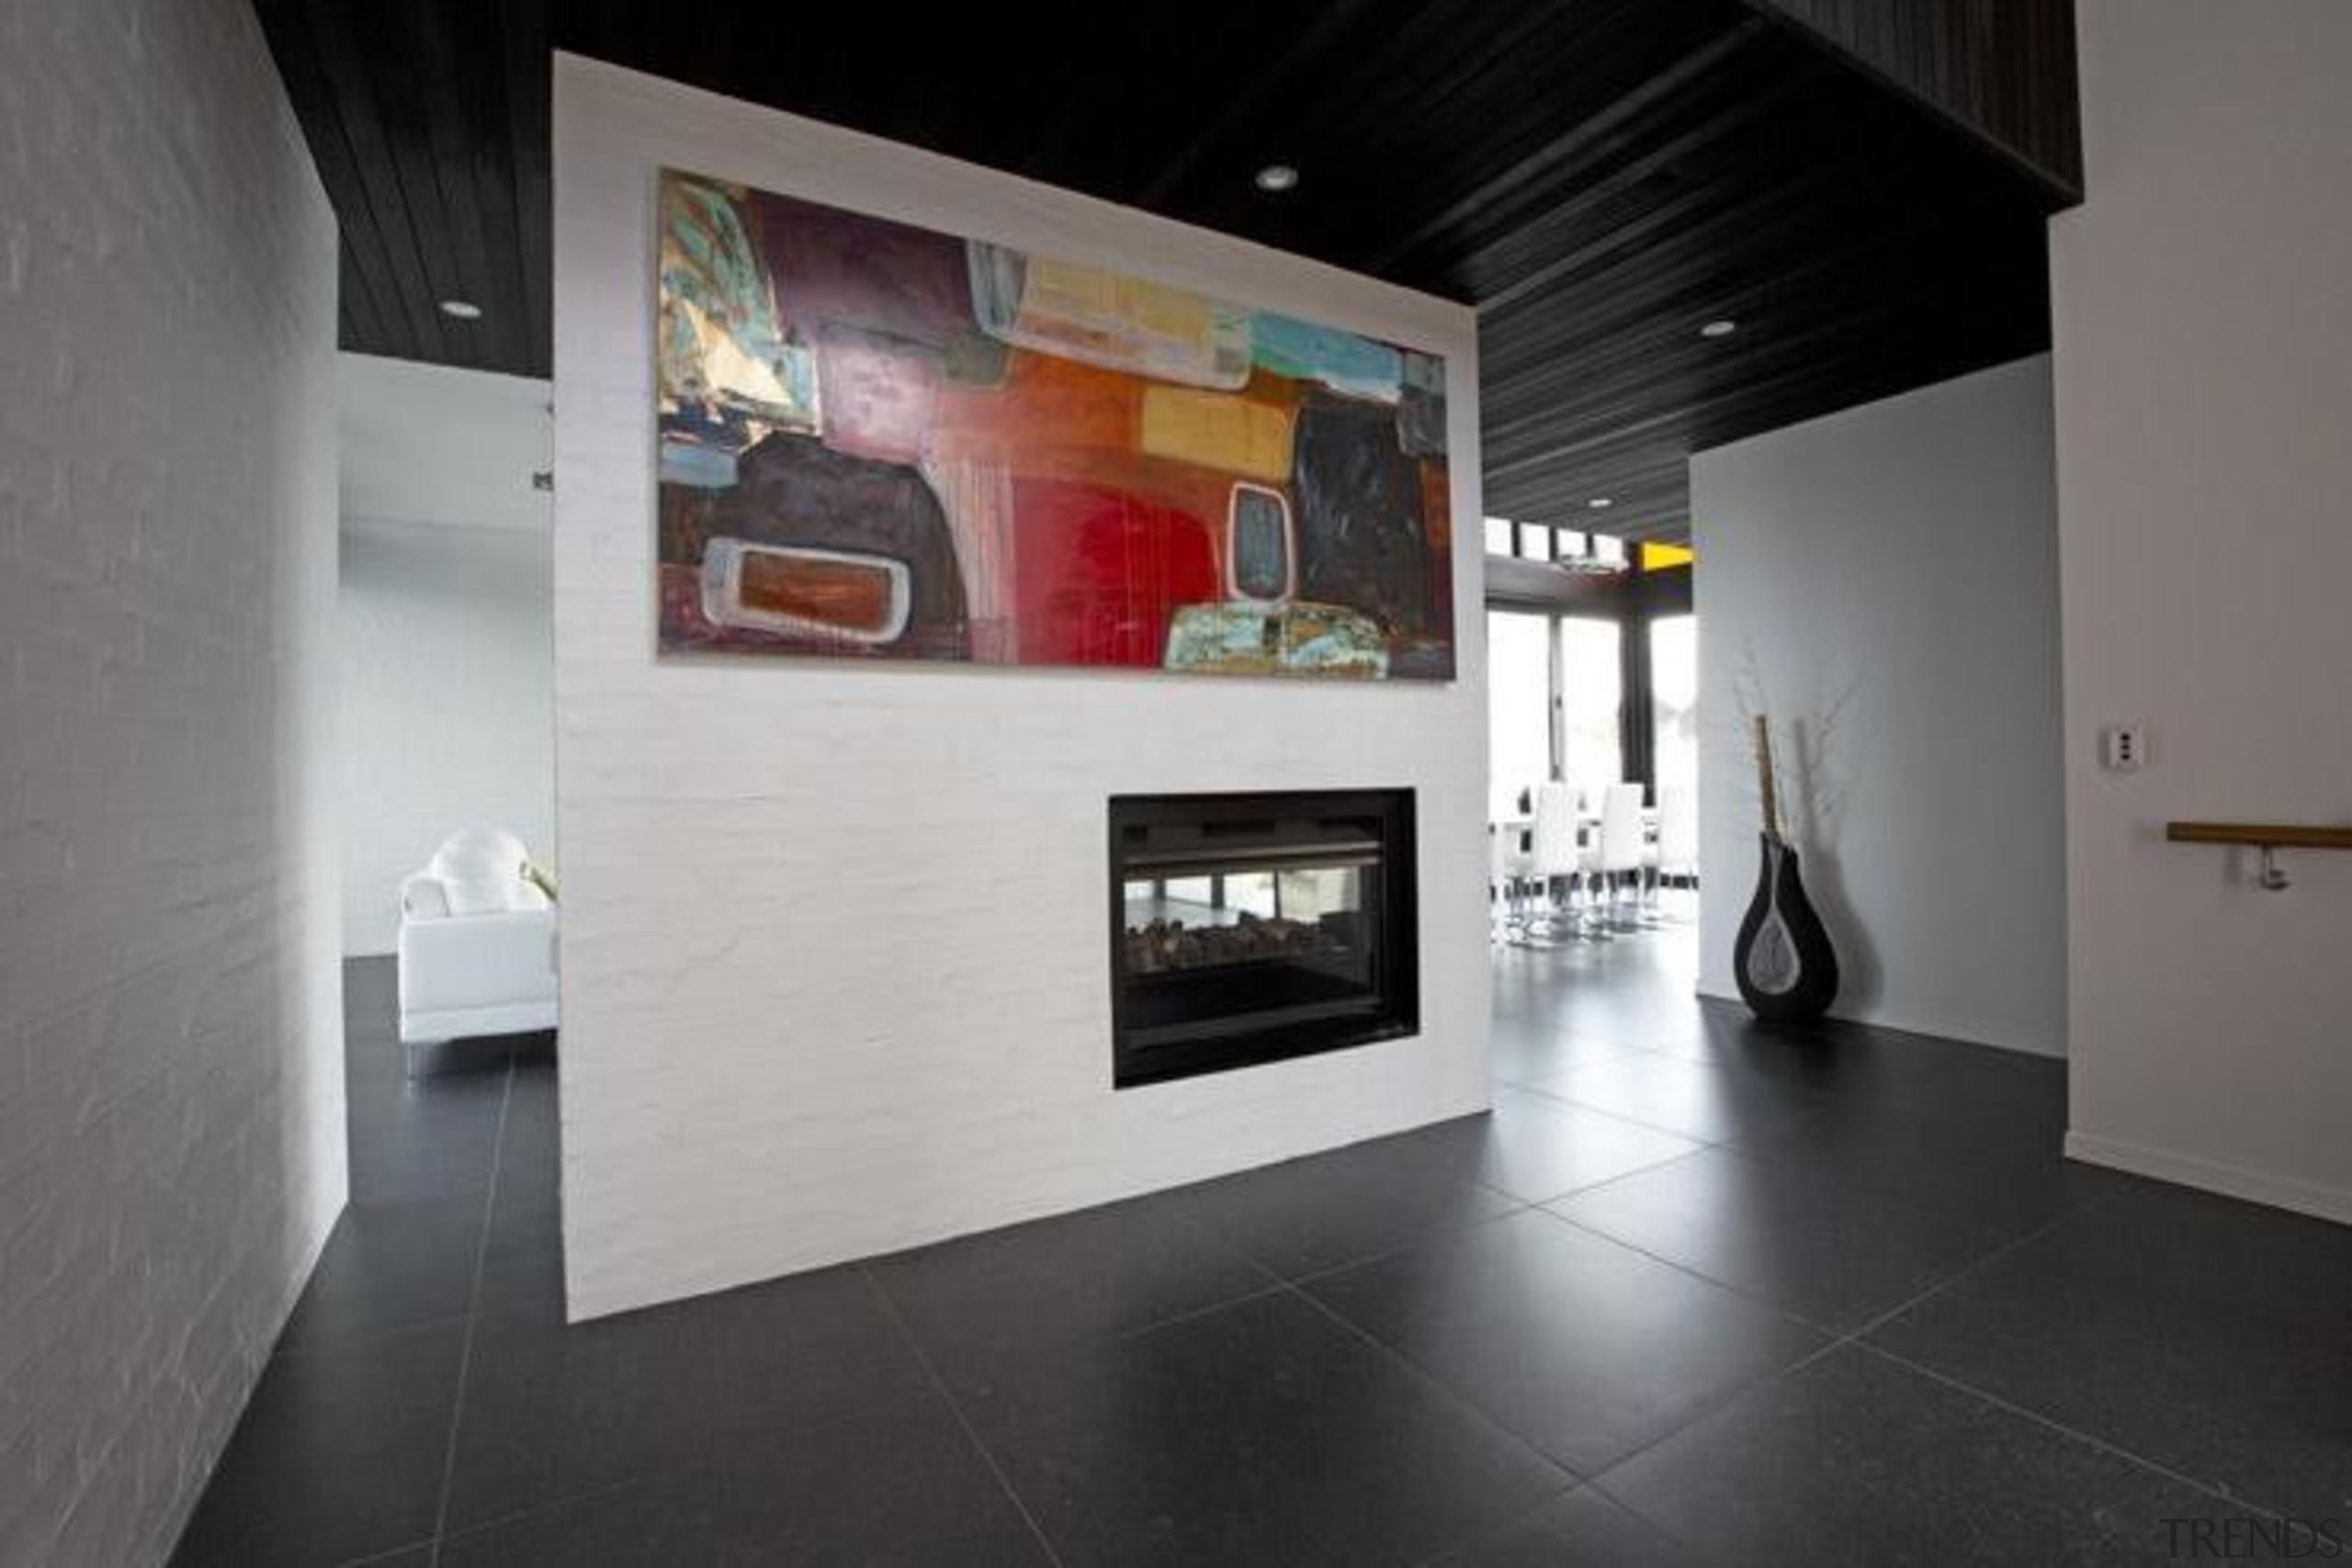 Ivory black hallway area. - Blue Mountain Range exhibition, floor, flooring, hearth, interior design, property, gray, black